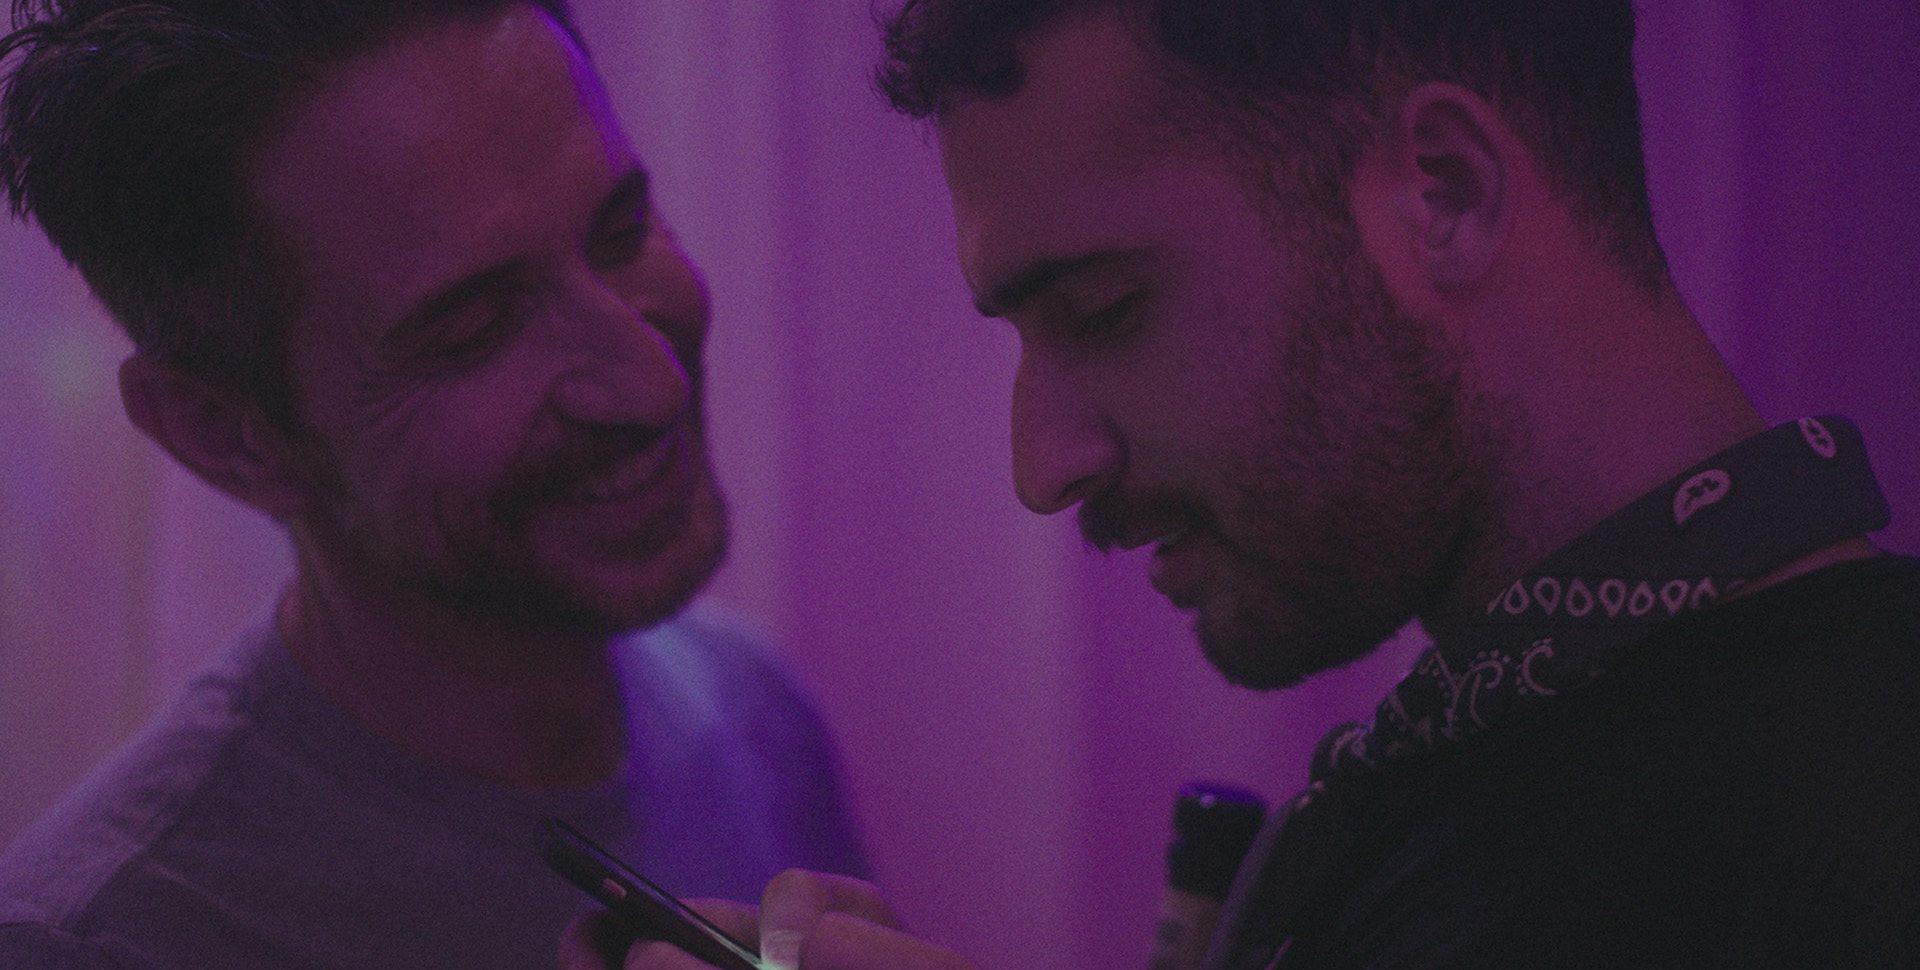 http://mdfilmfest.com/wp-content/uploads/CYF_web.jpg